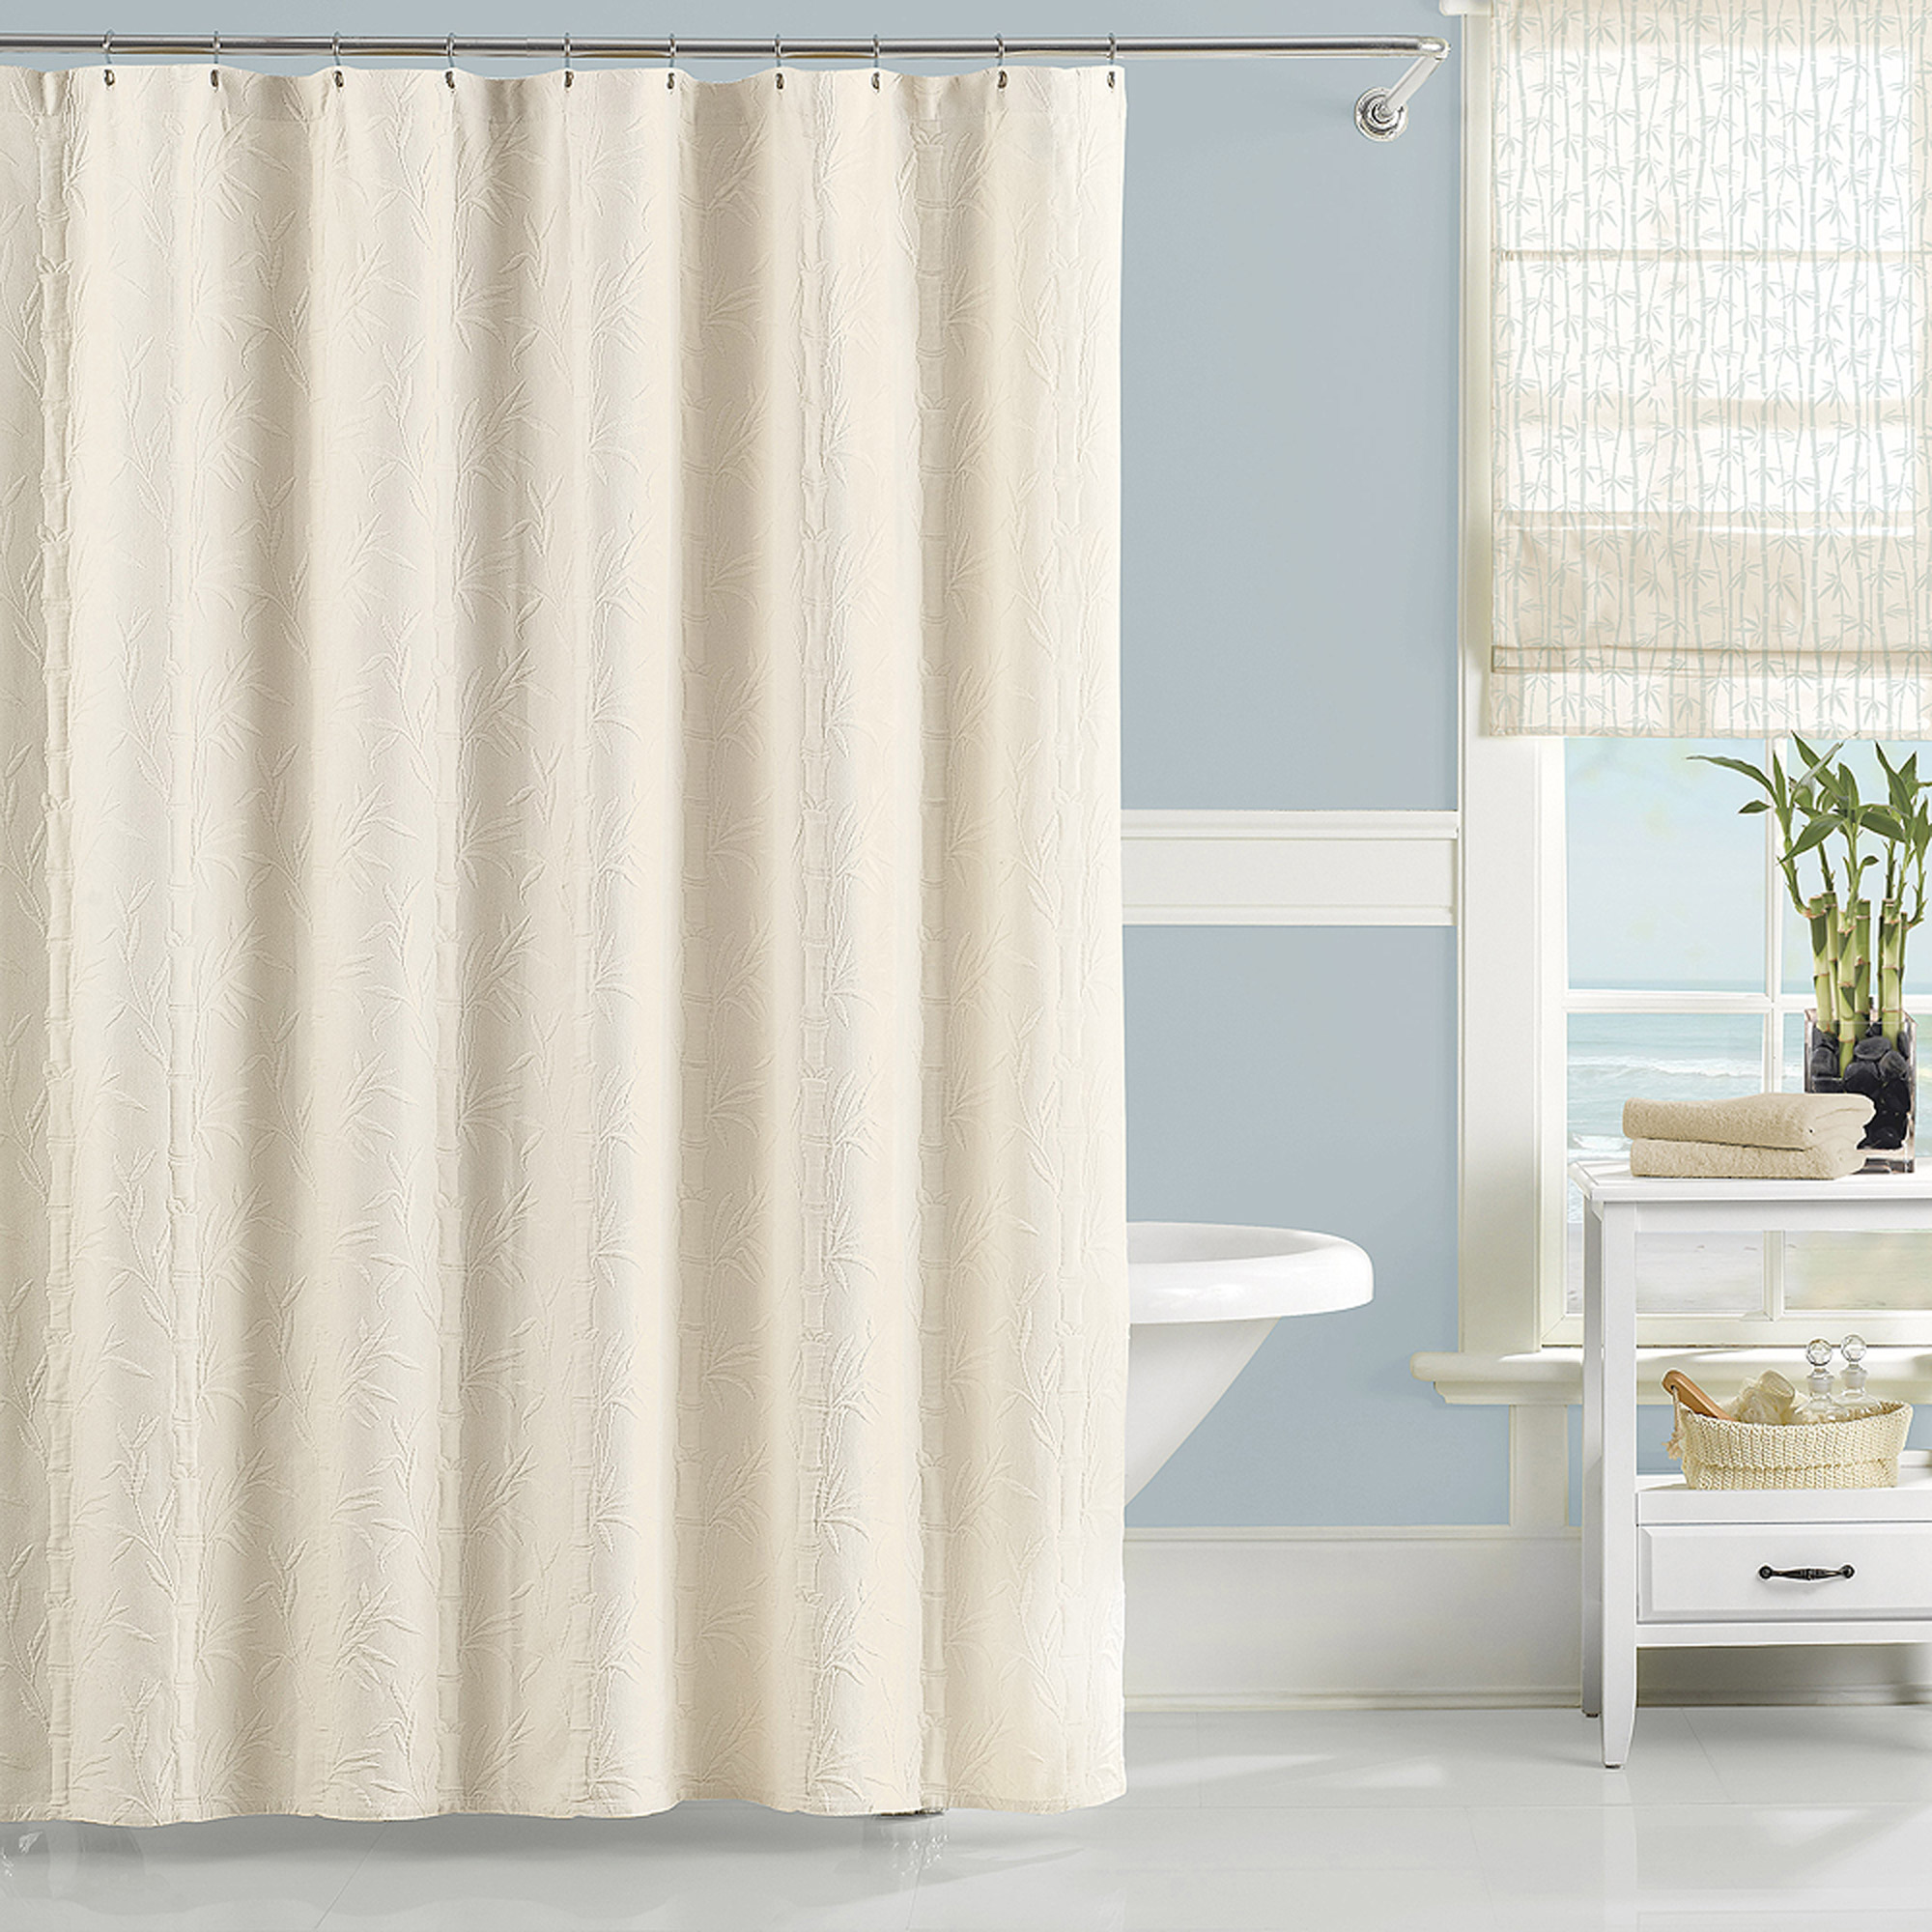 LaMont Home Nepal Shower Curtain - 100% Cotton